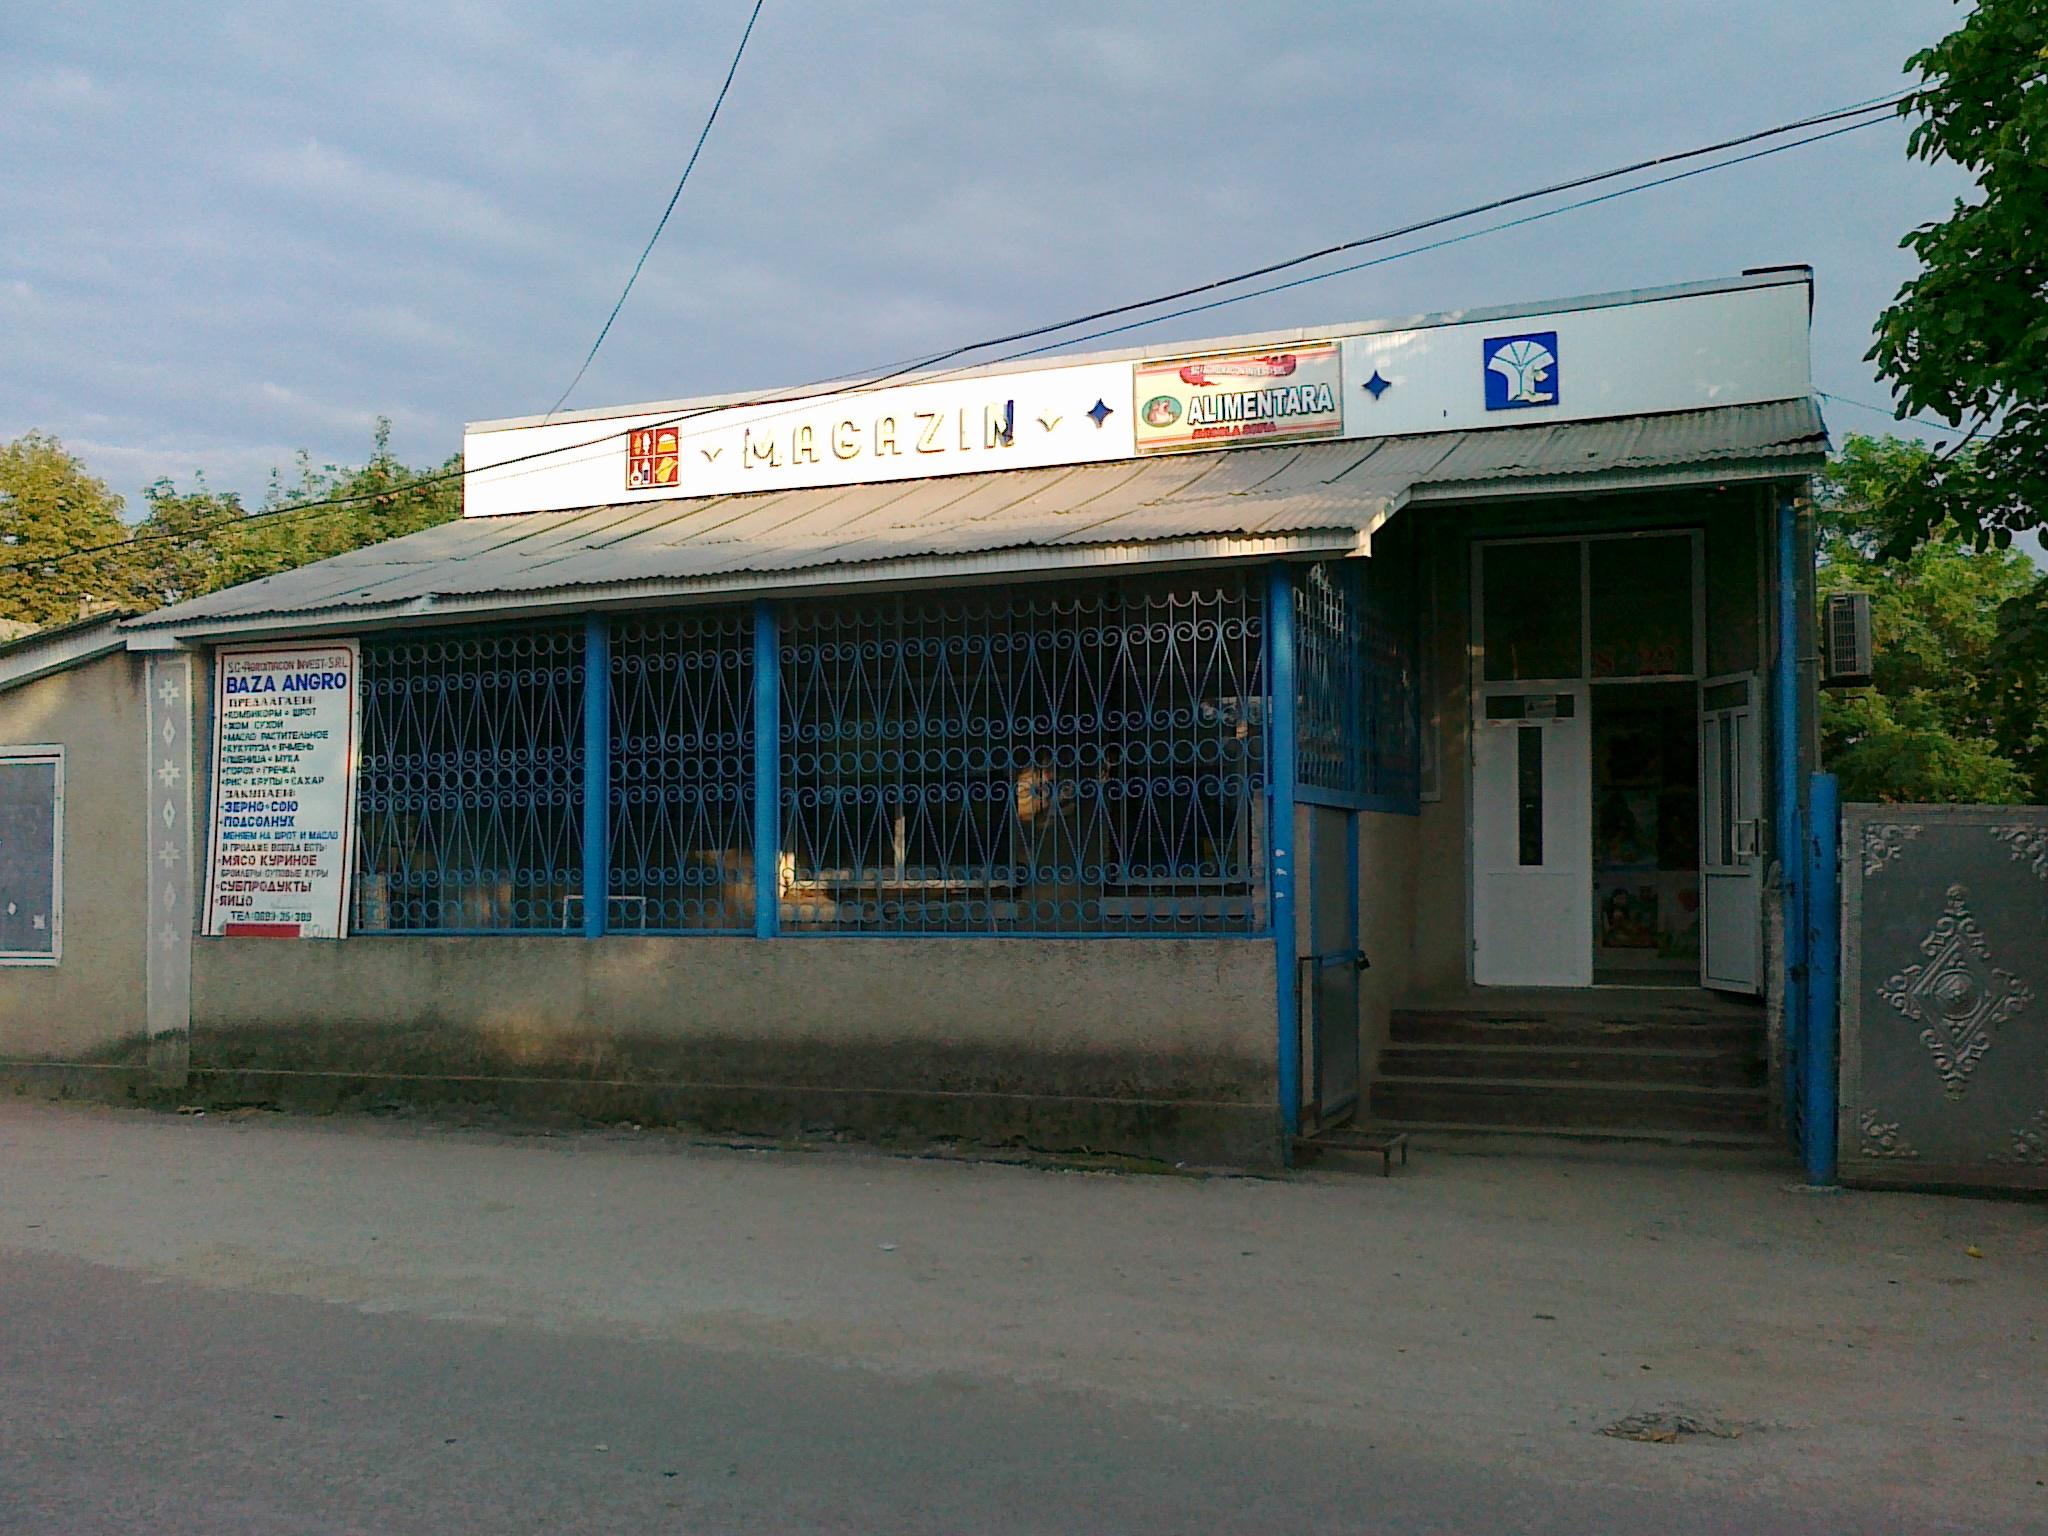 Constructie comerciala, or. Edinet